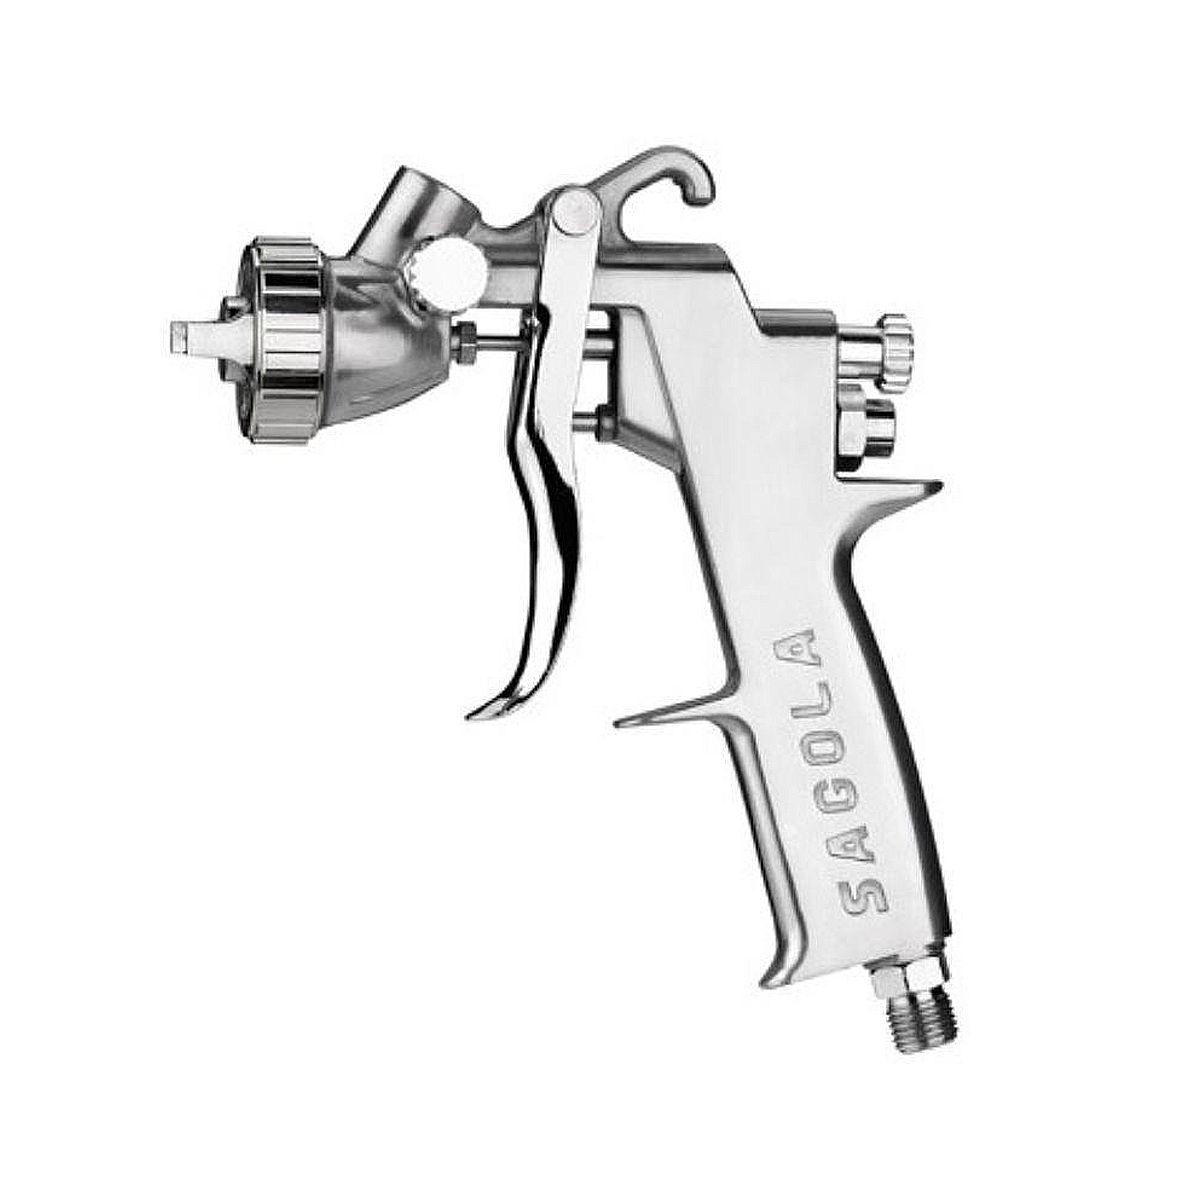 Pistola de Gravidade Junior G 1.4 Sagola